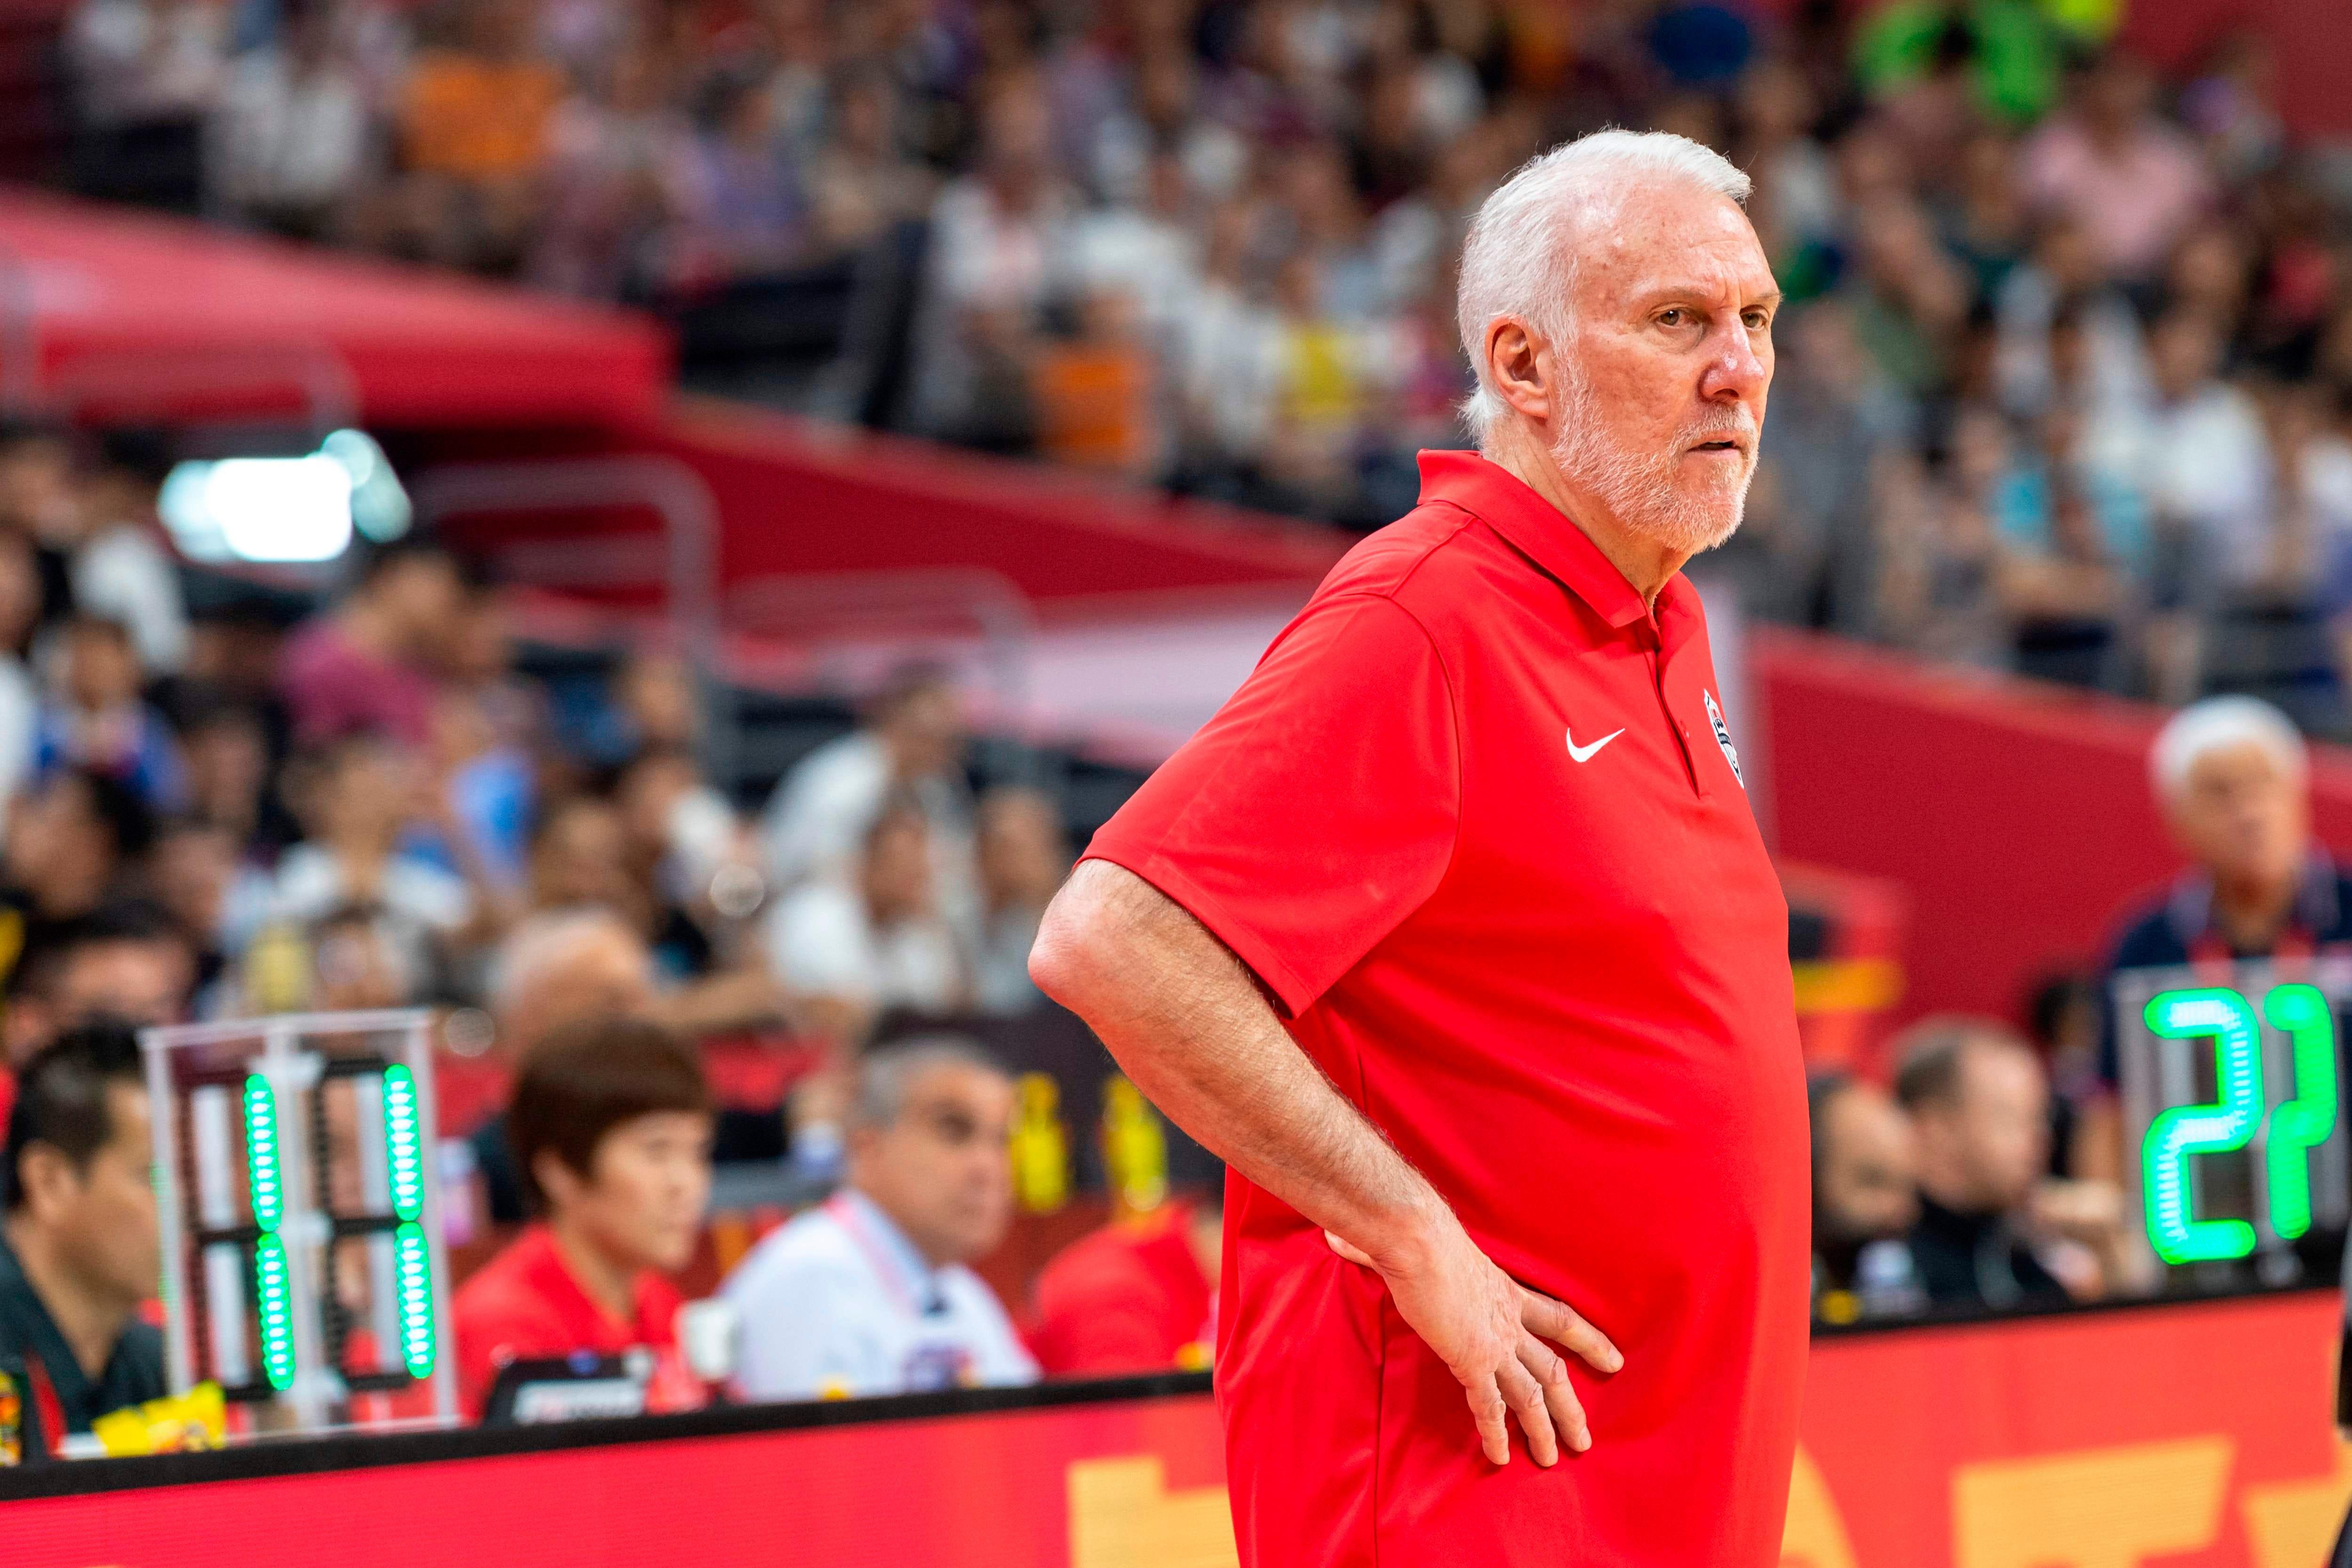 USA Basketball falls to Serbia, endures worst major tournament finish thumbnail